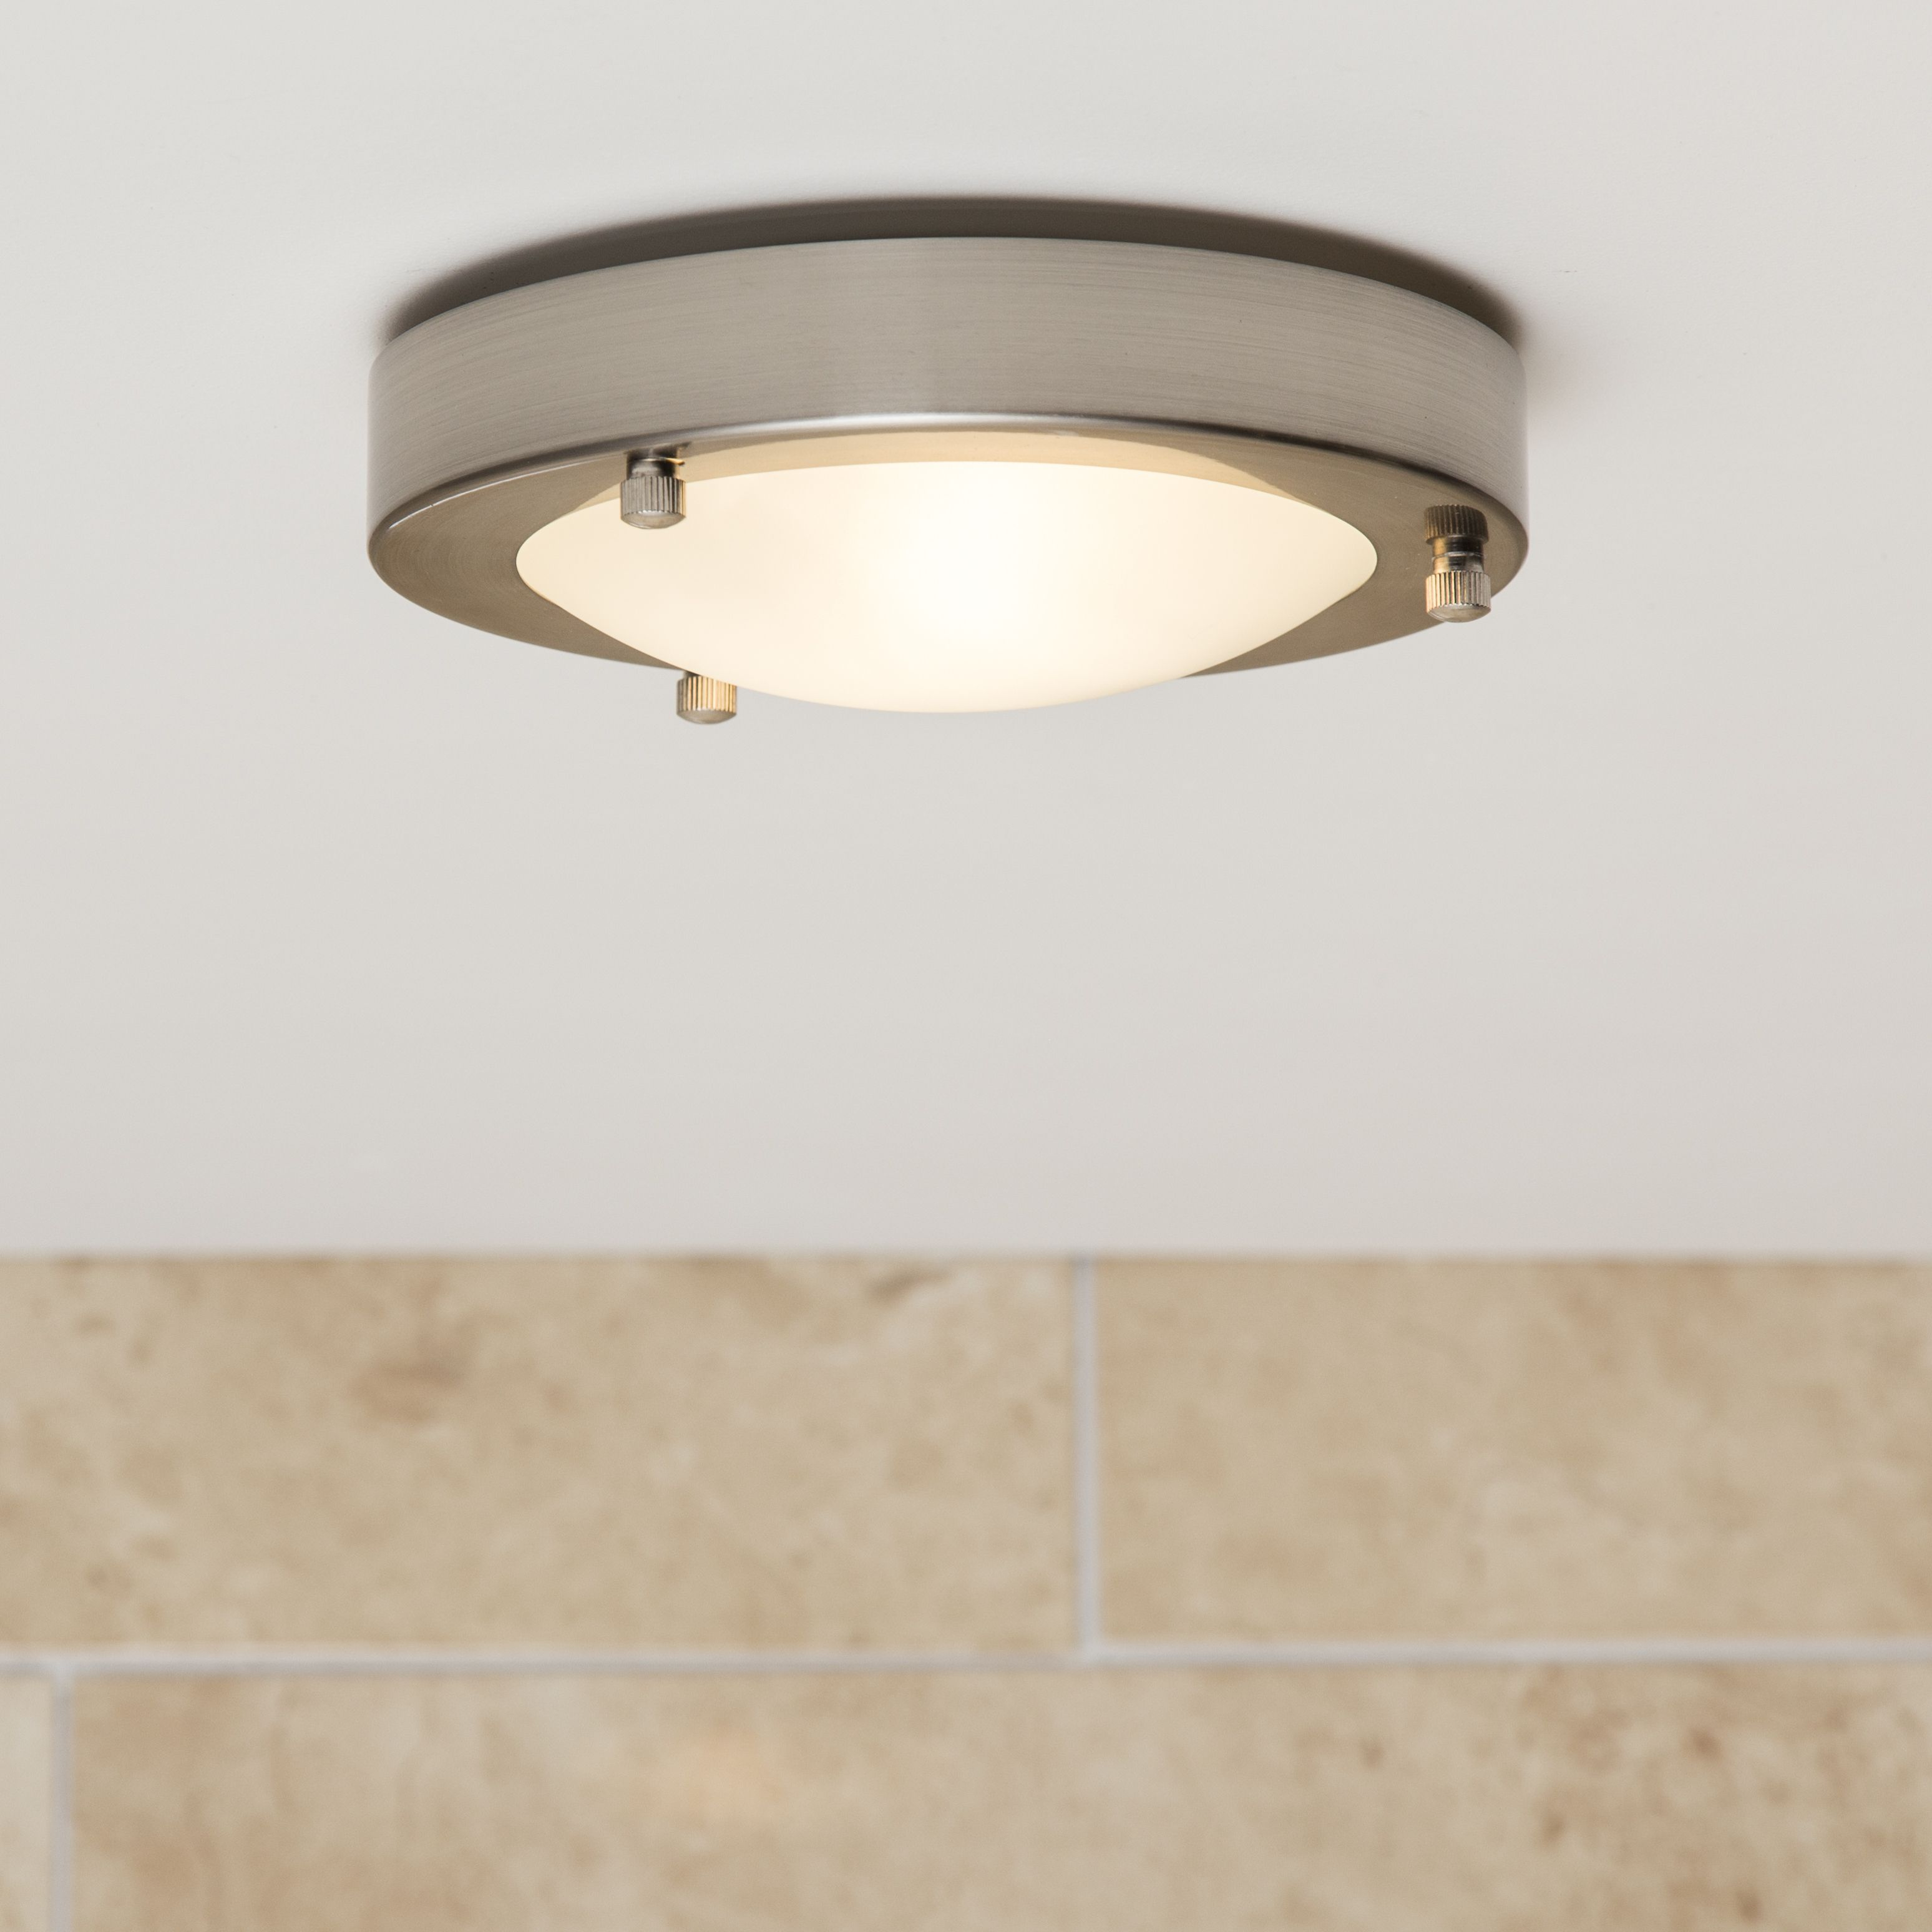 Forum Canis Small Flush Fitting Bathroom Light Bathroom Lighting